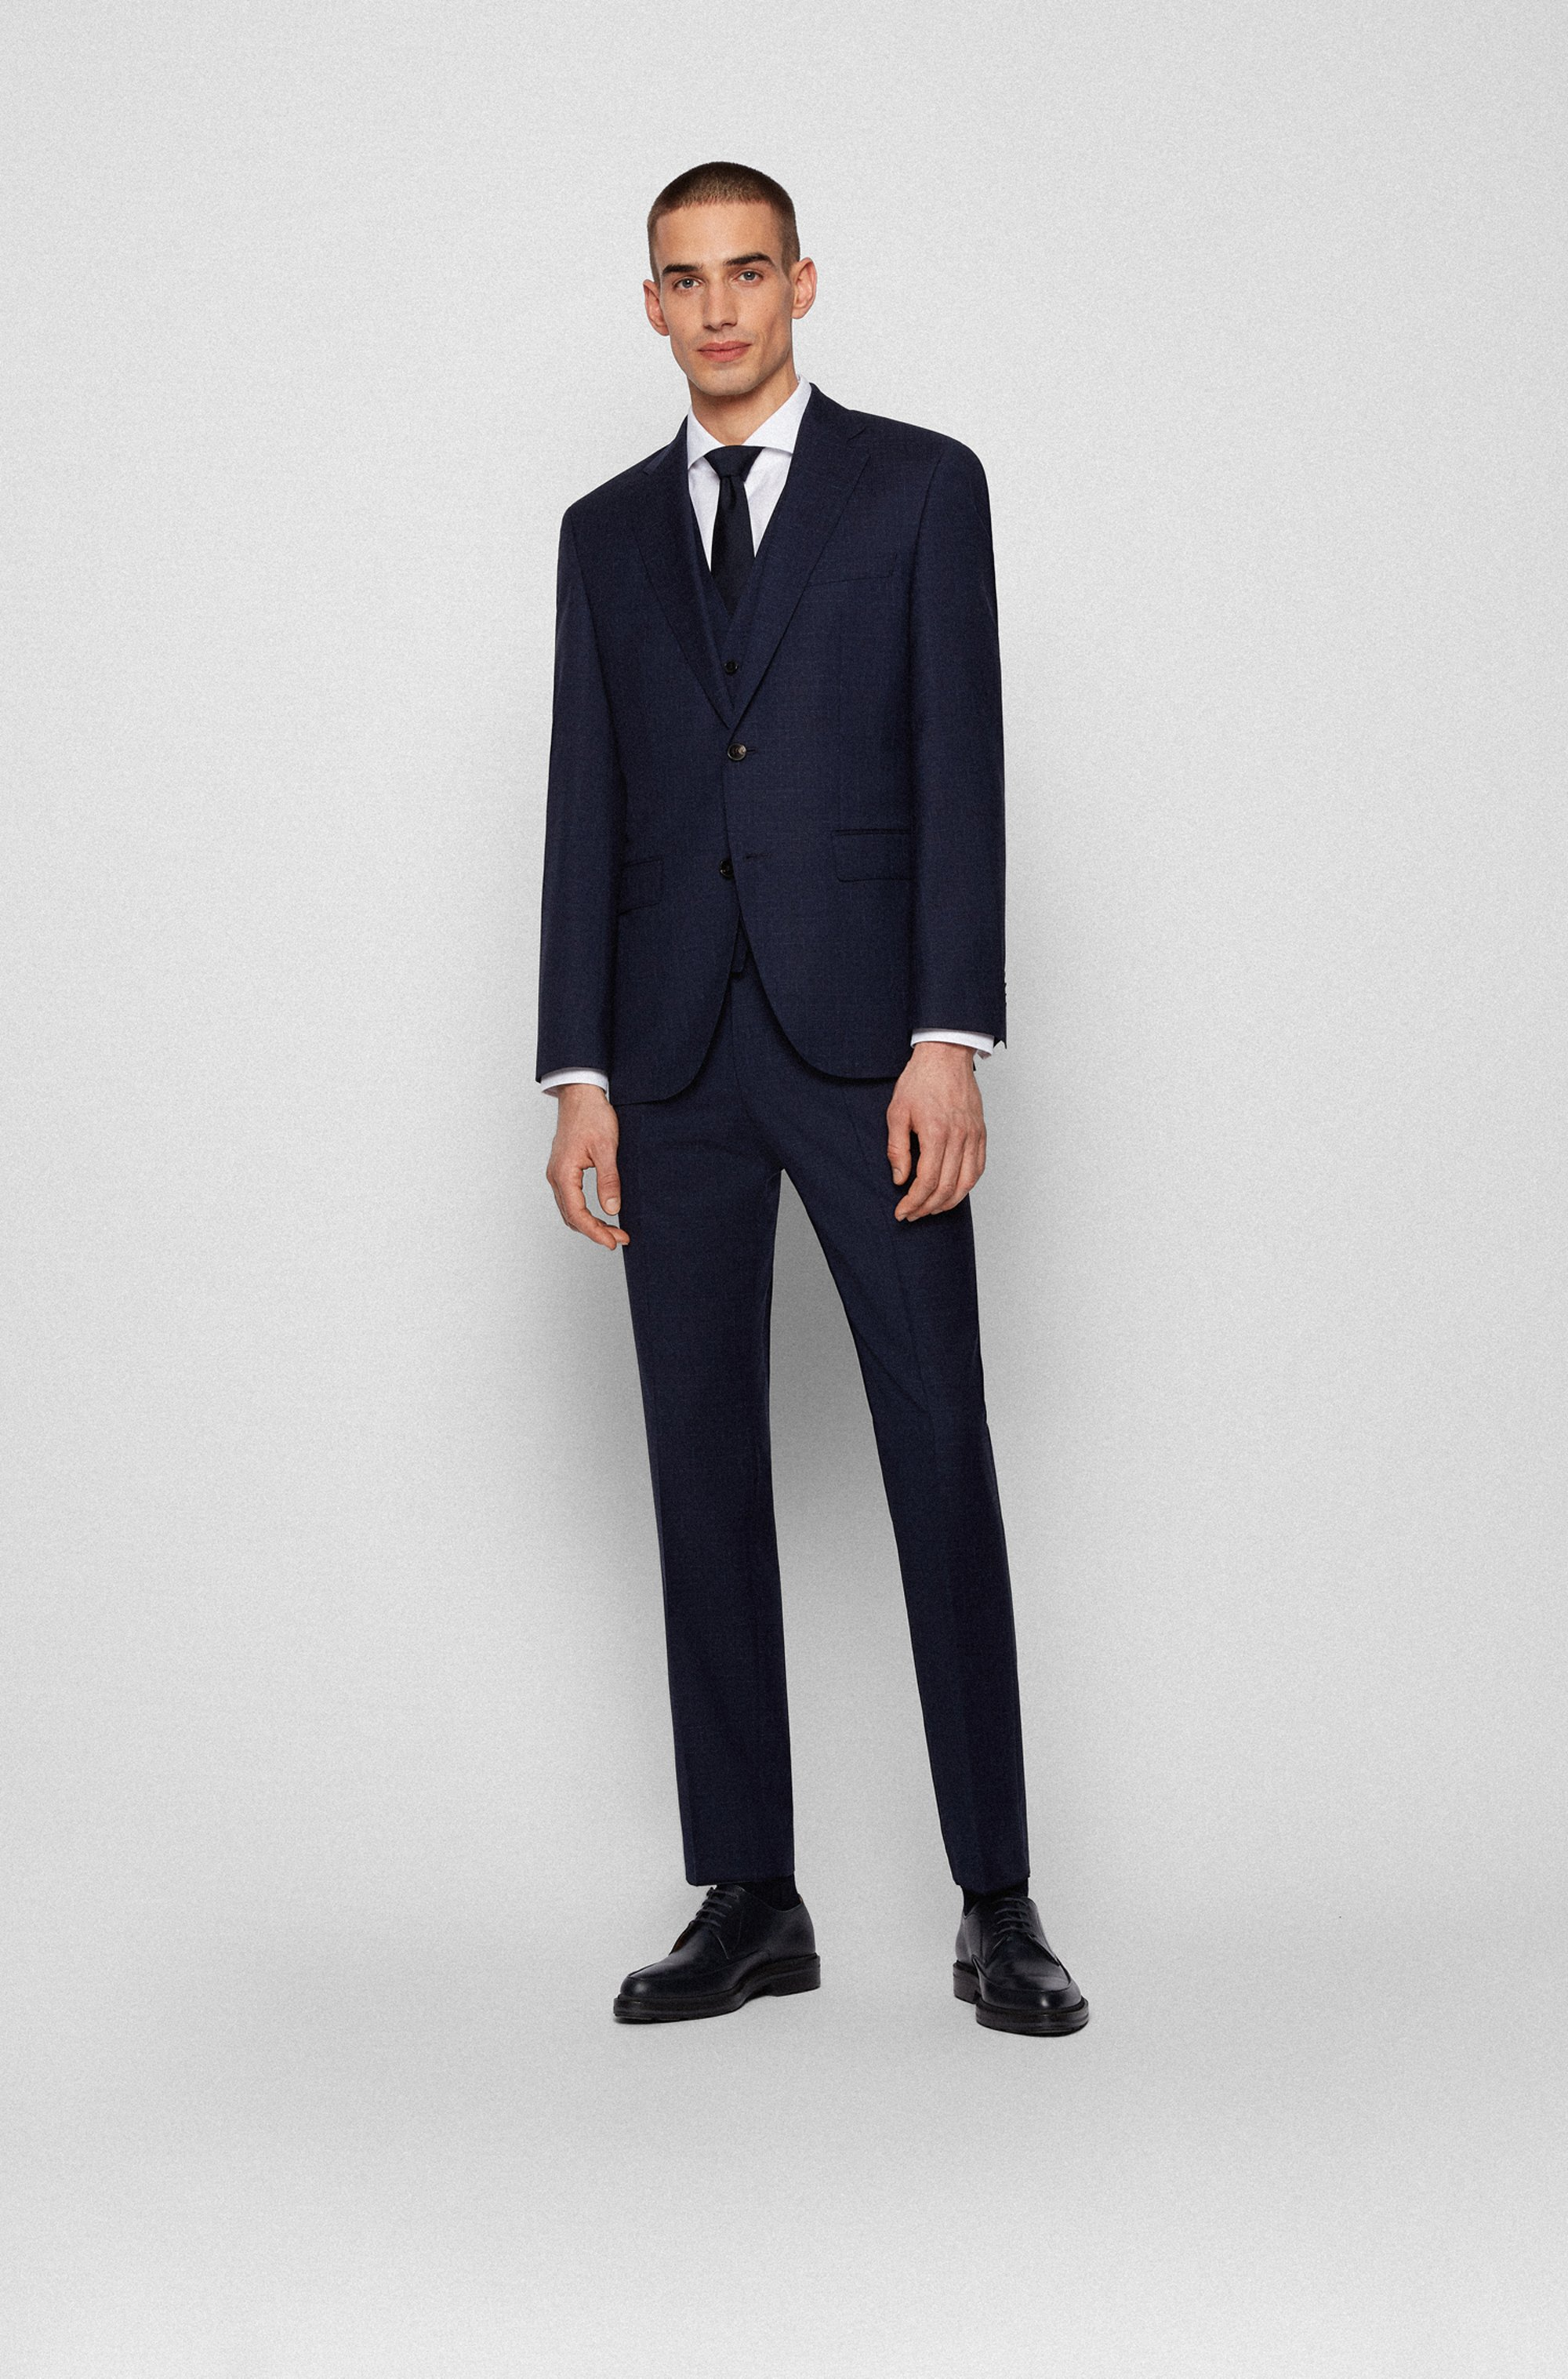 Three-piece regular-fit suit in patterned virgin wool